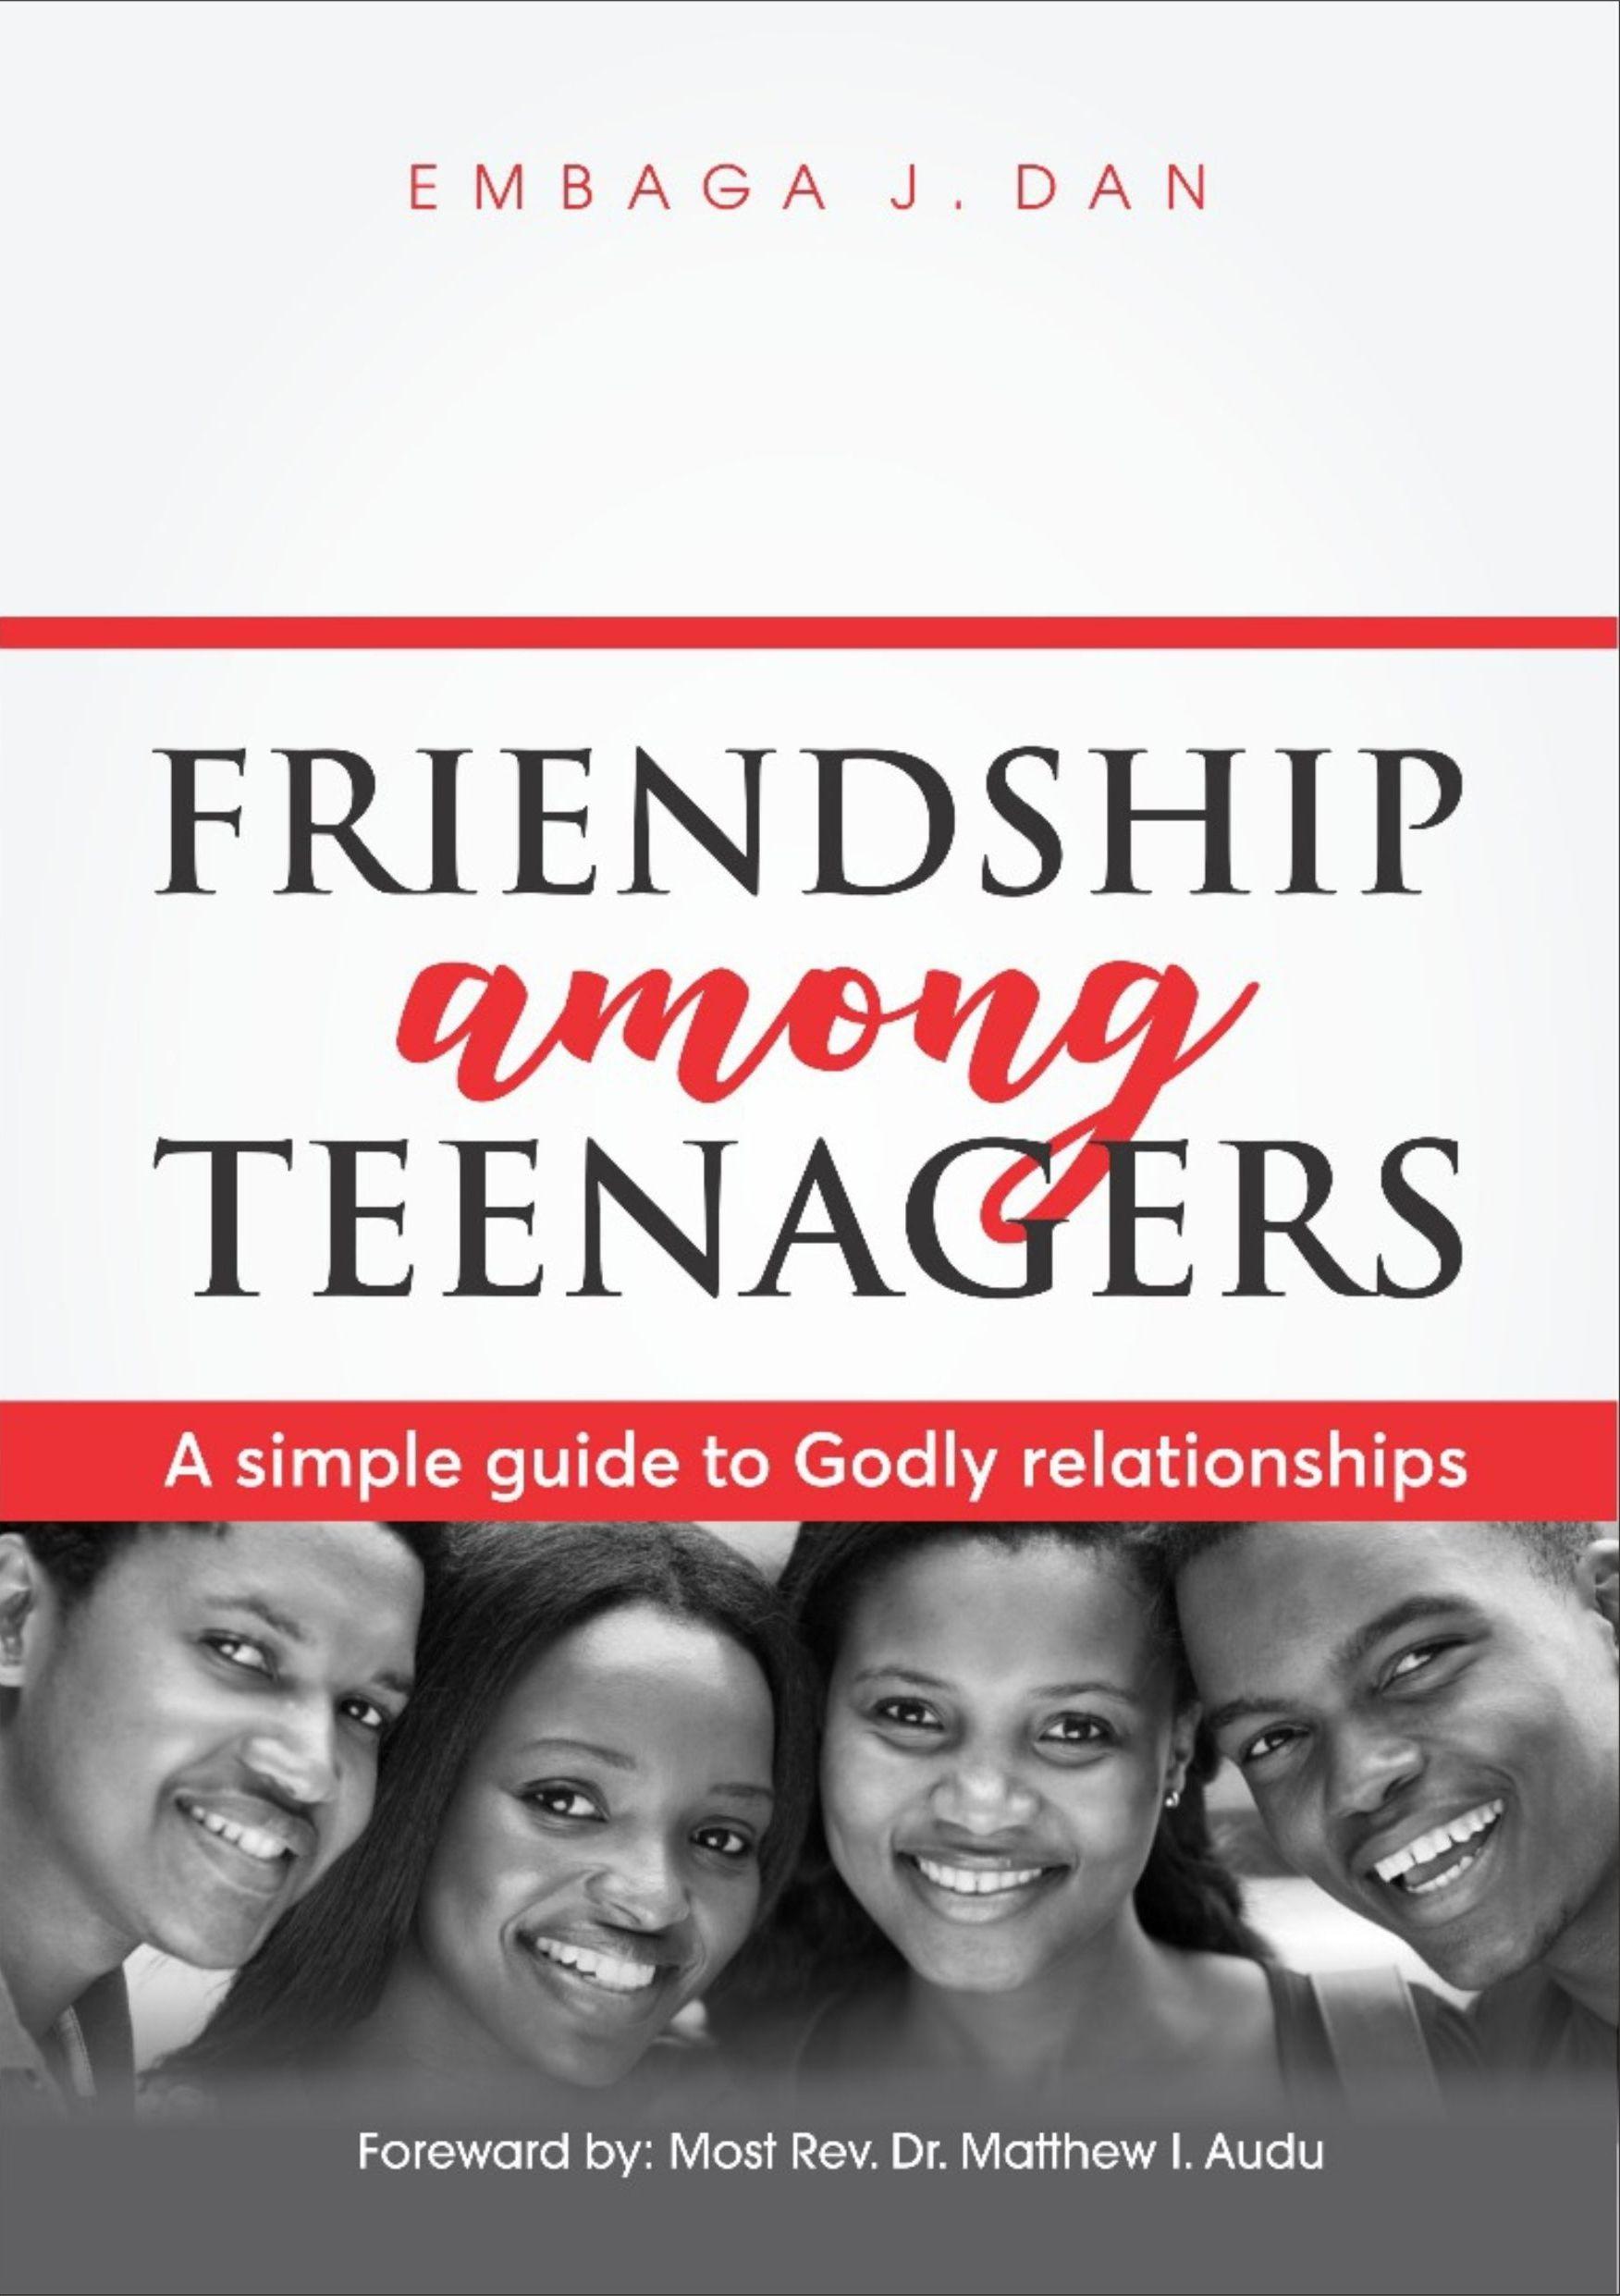 FRIENDSHIP AMONGST TEENAGERS